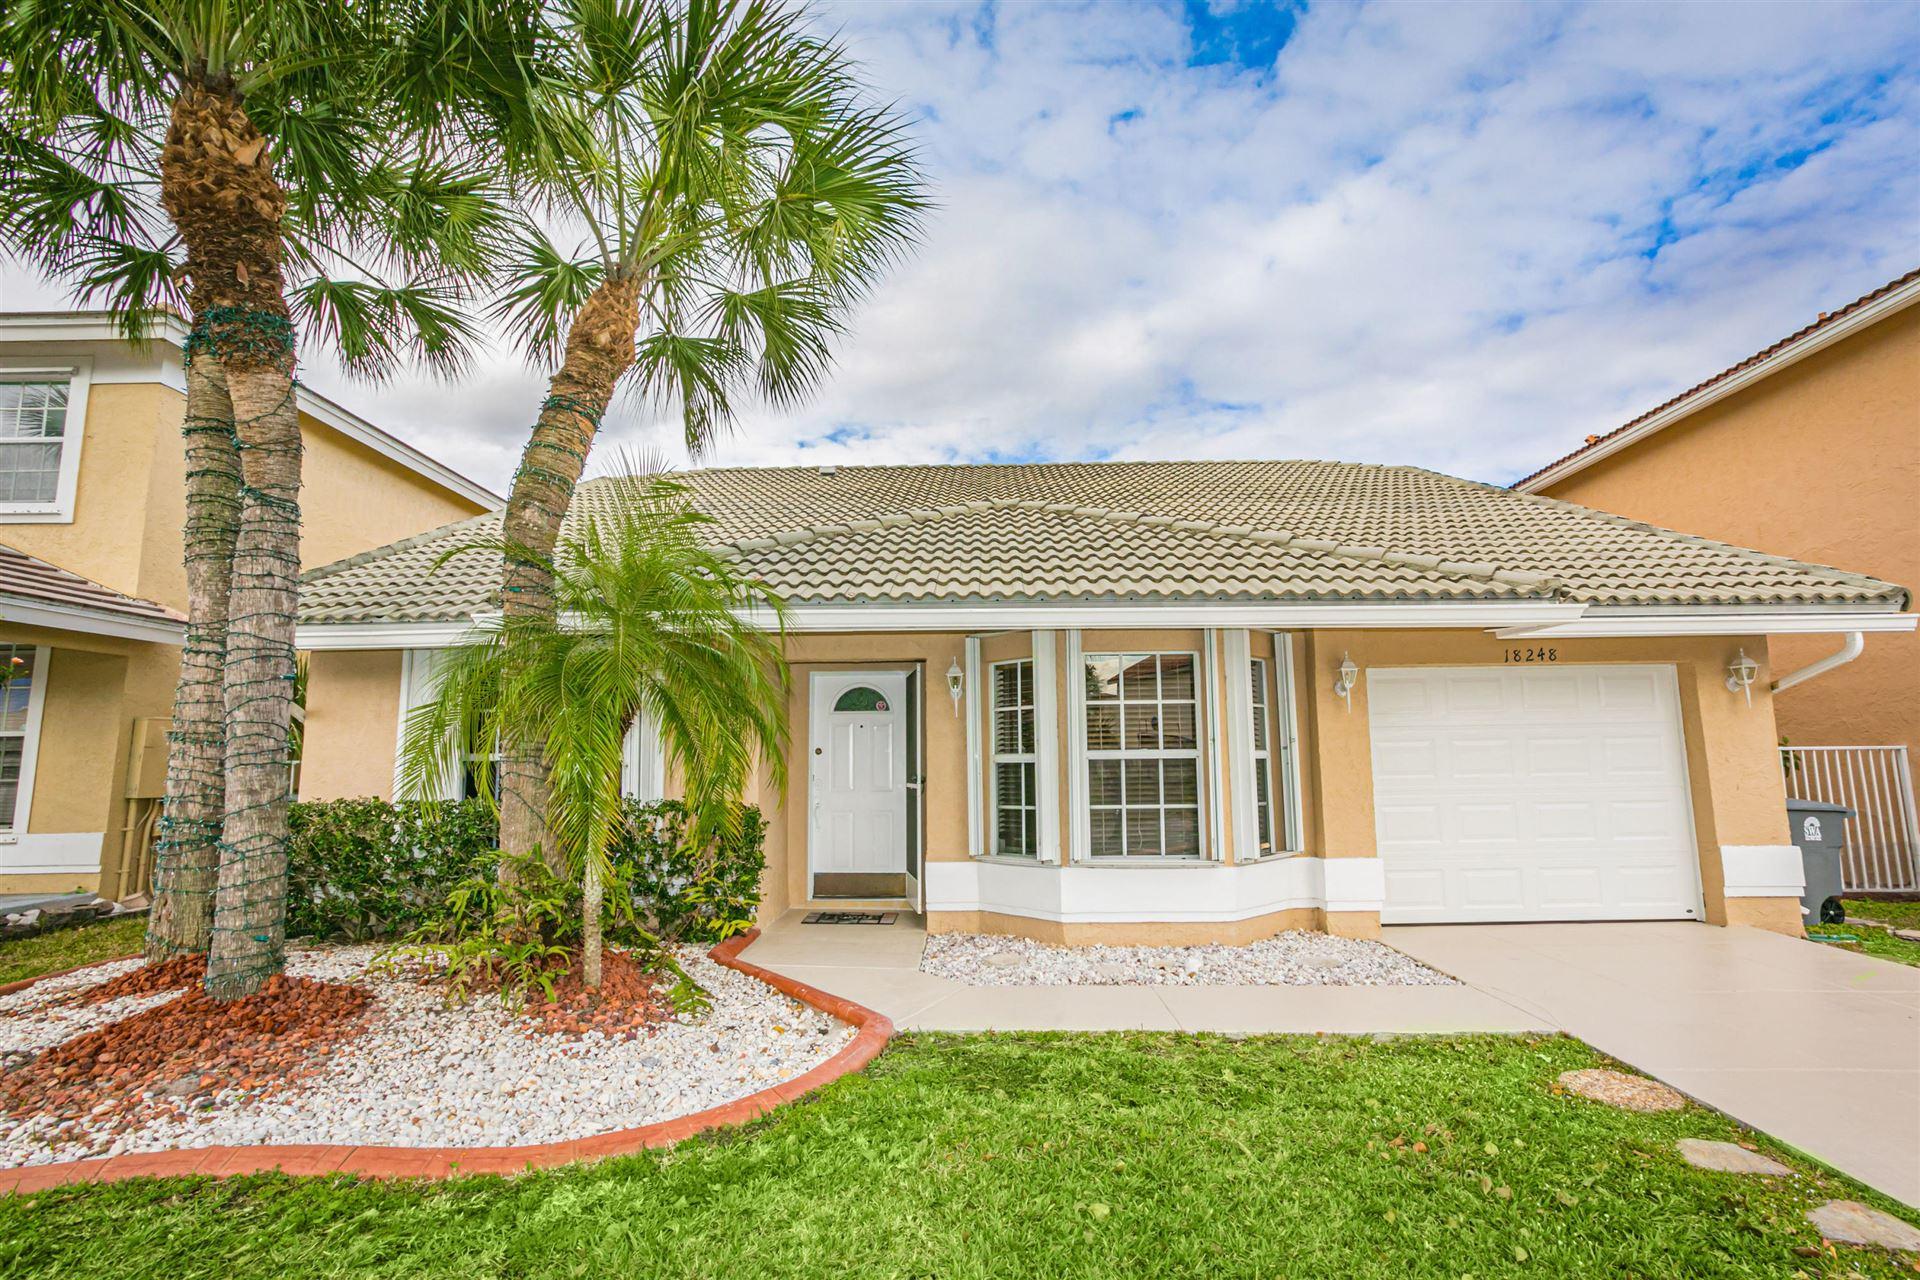 18248 Clear Brook Circle, Boca Raton, FL 33498 - #: RX-10685364